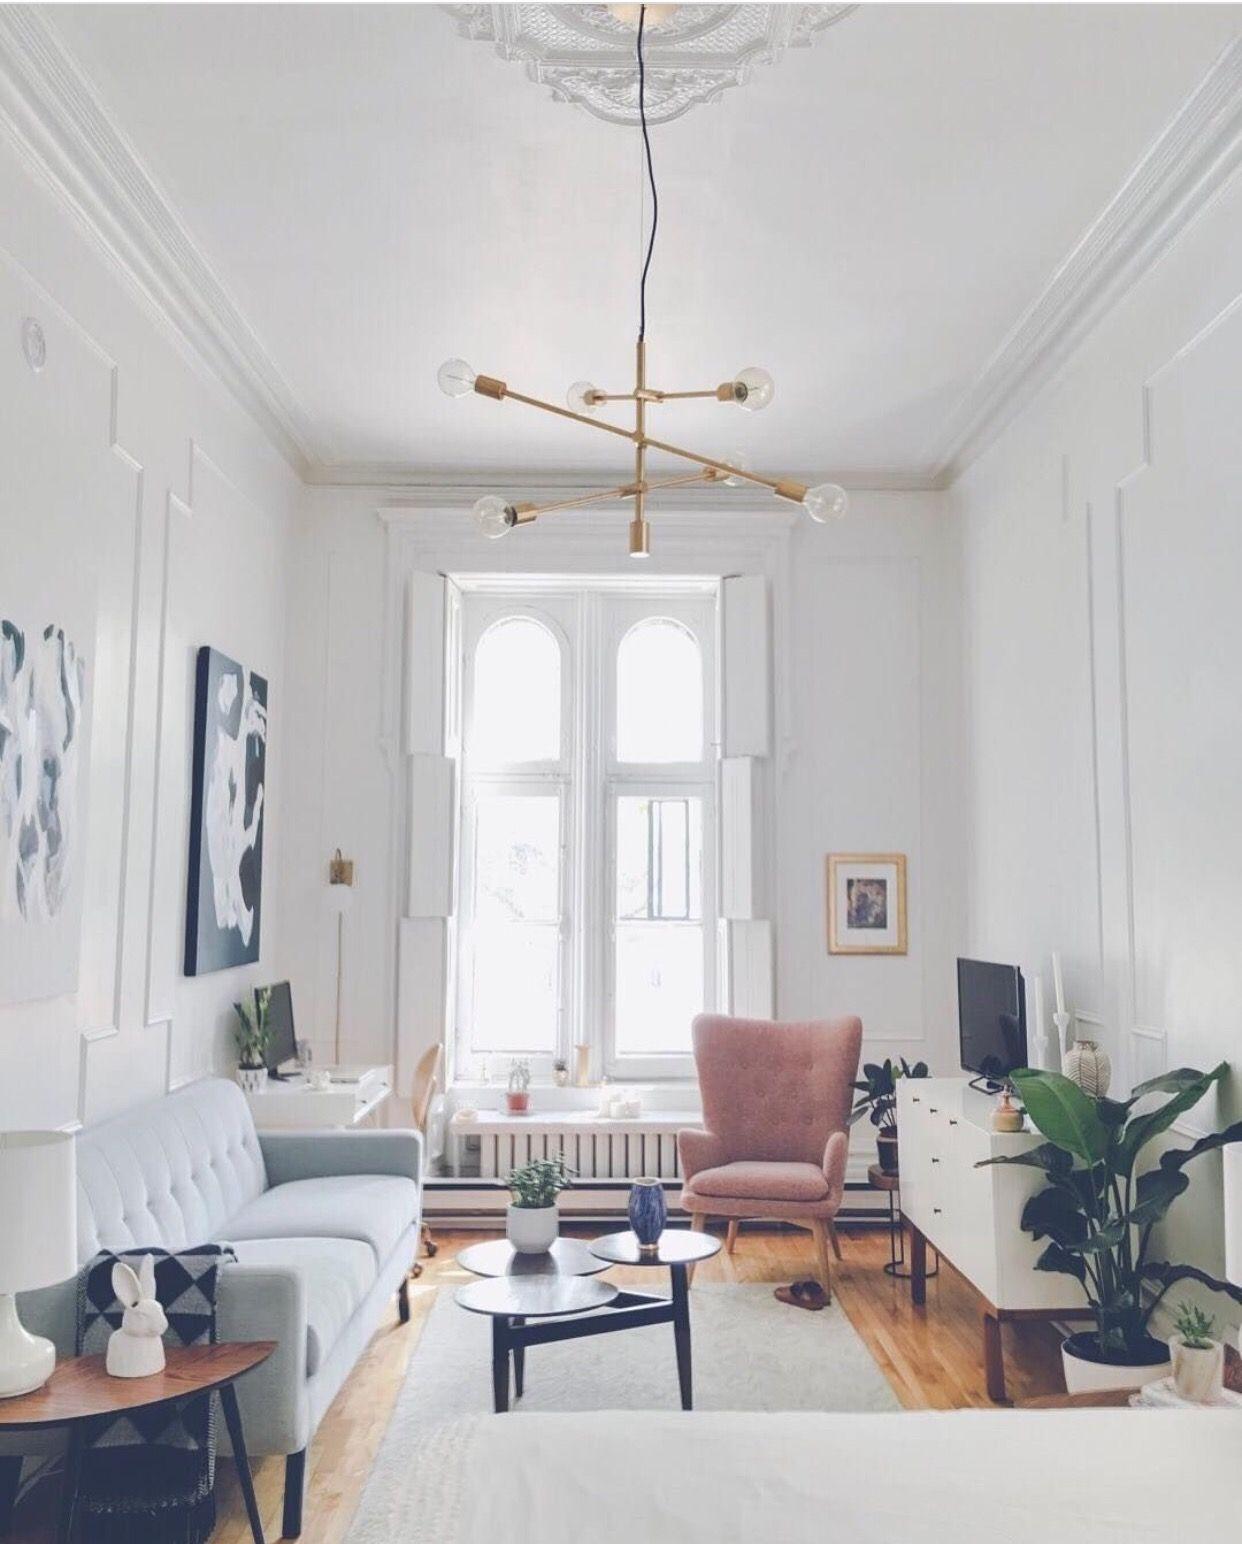 Pin By Sami Woolhiser On The Rosebud Apartment Interior